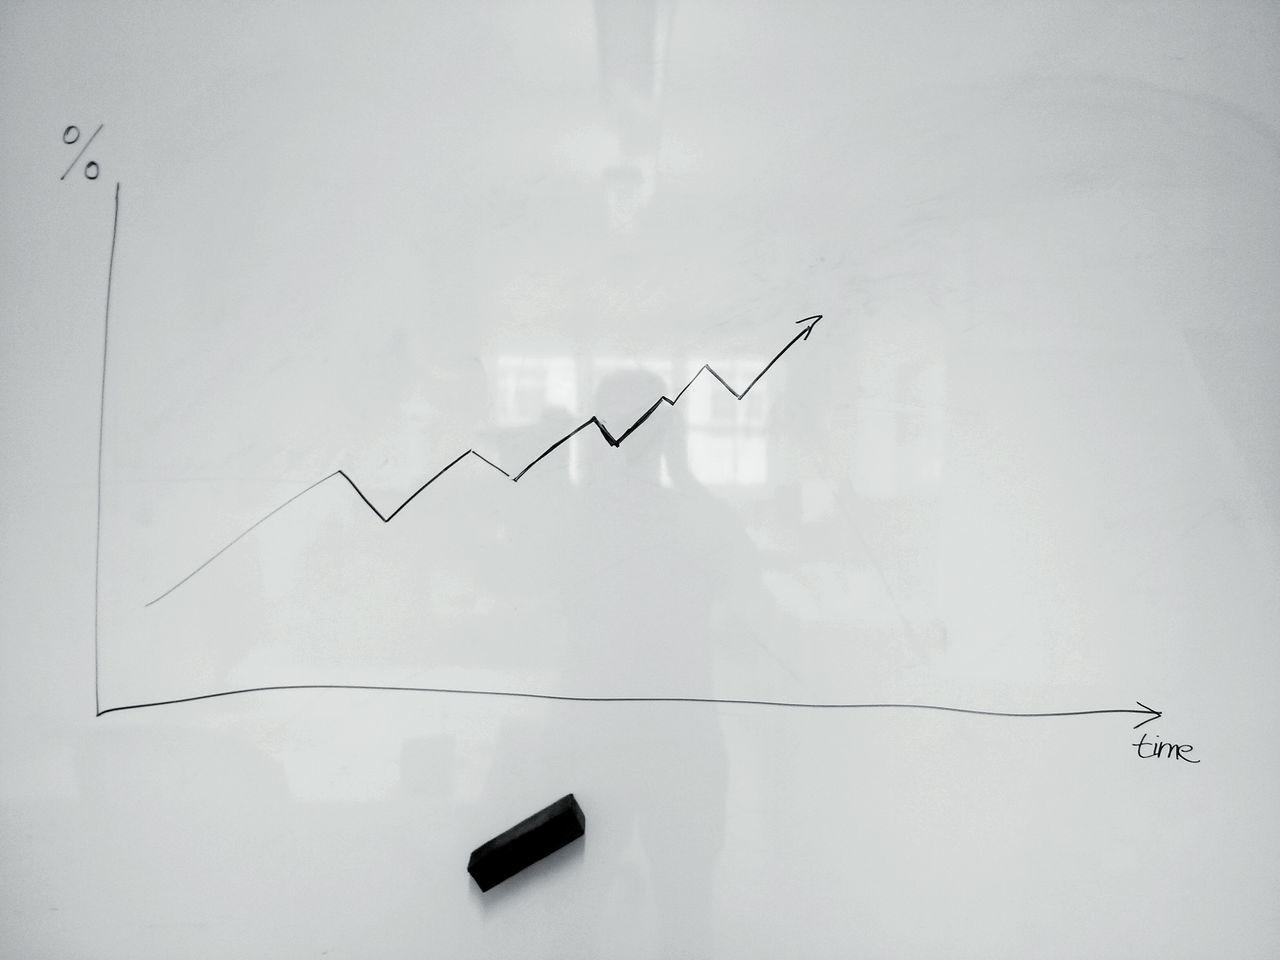 Stocks Chart impro Whiteboard